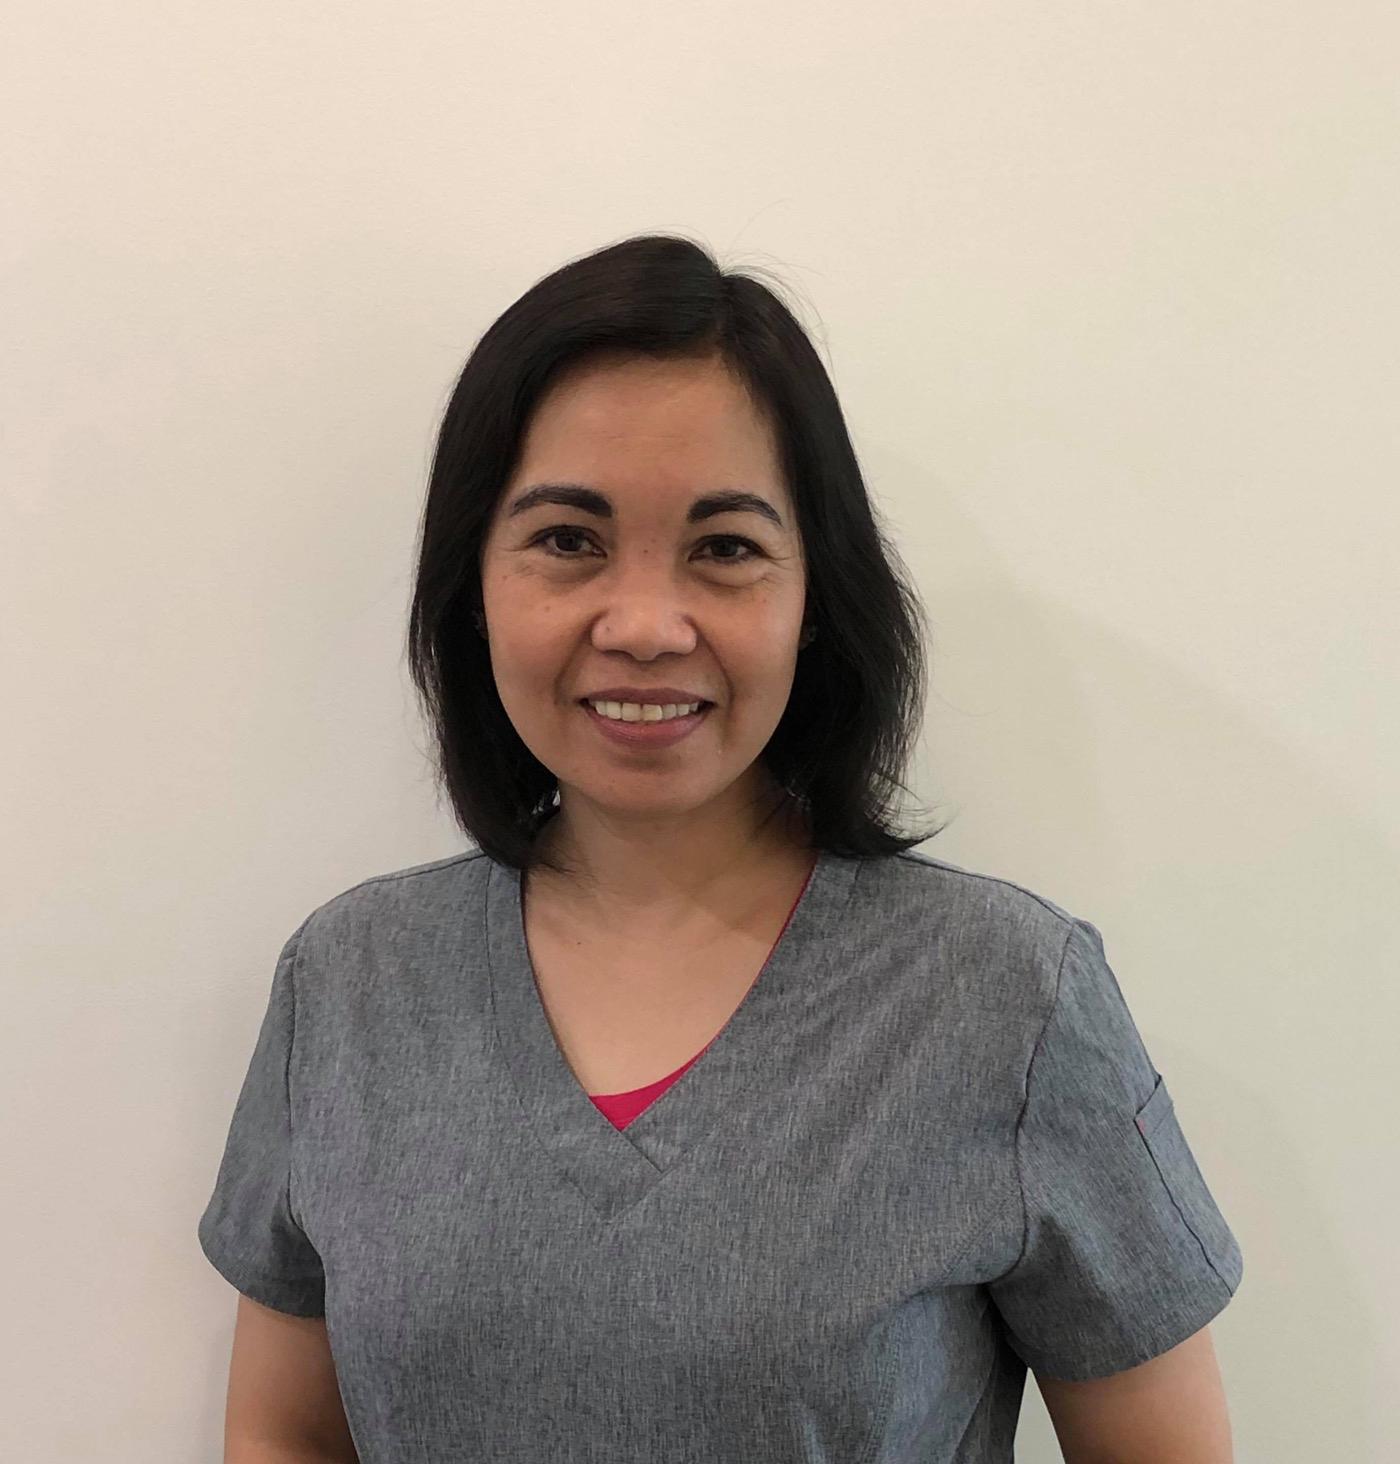 Arlene medical office assistant iHealthMD North Vancouver